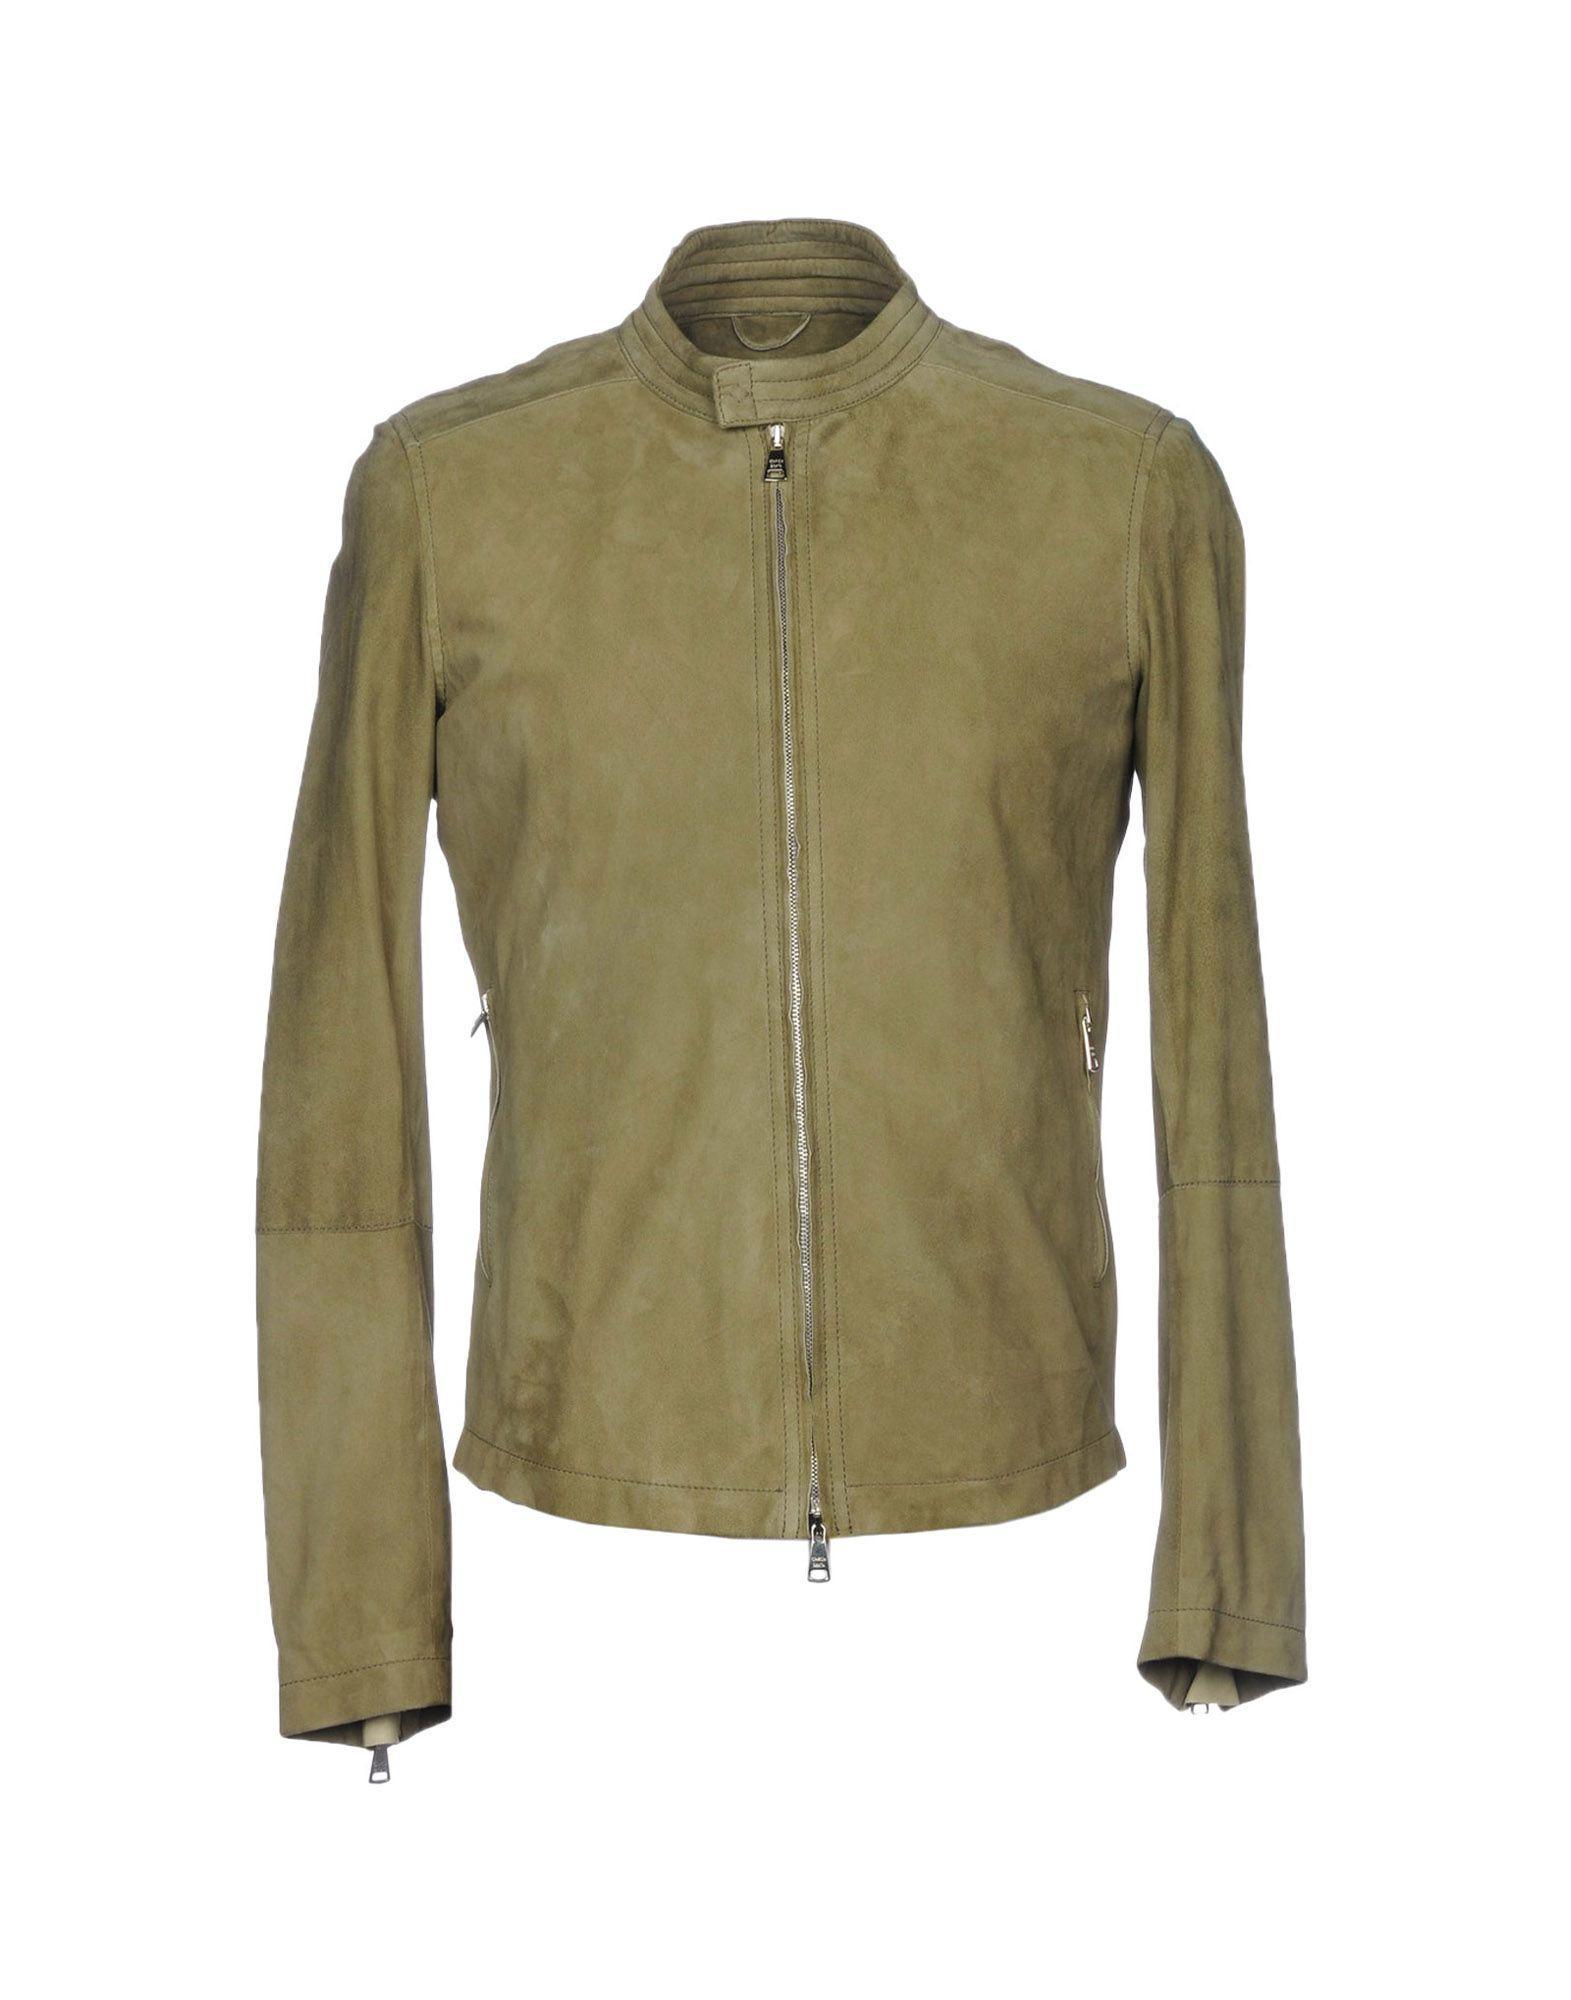 Giorgio Brato Leather Jacket In Military Green